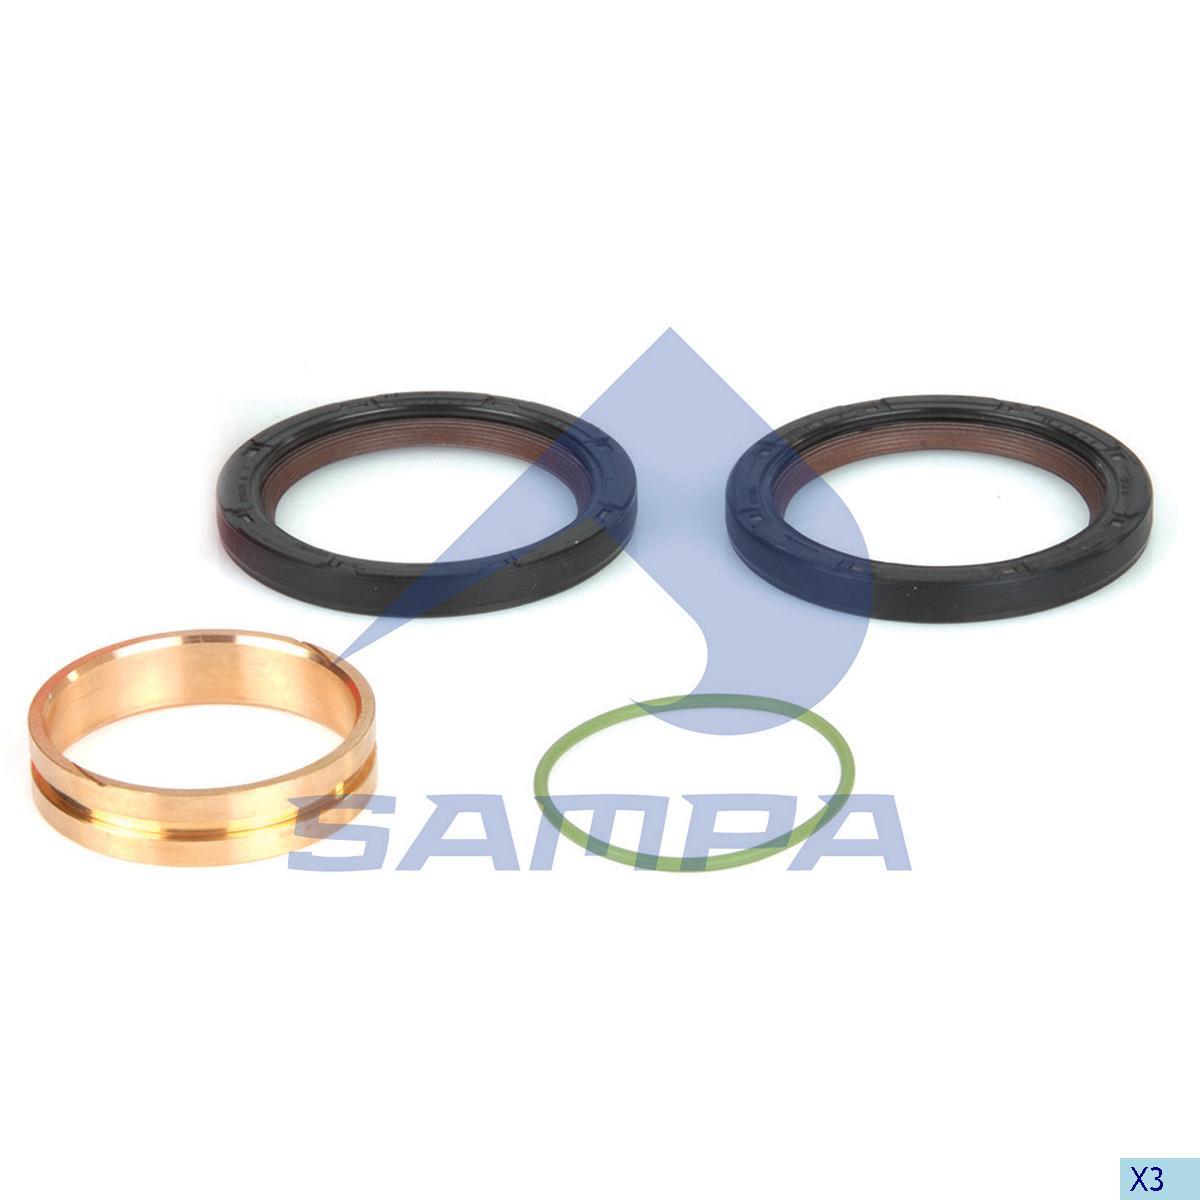 Repair Kit, Retarder, Scania, Gear Box